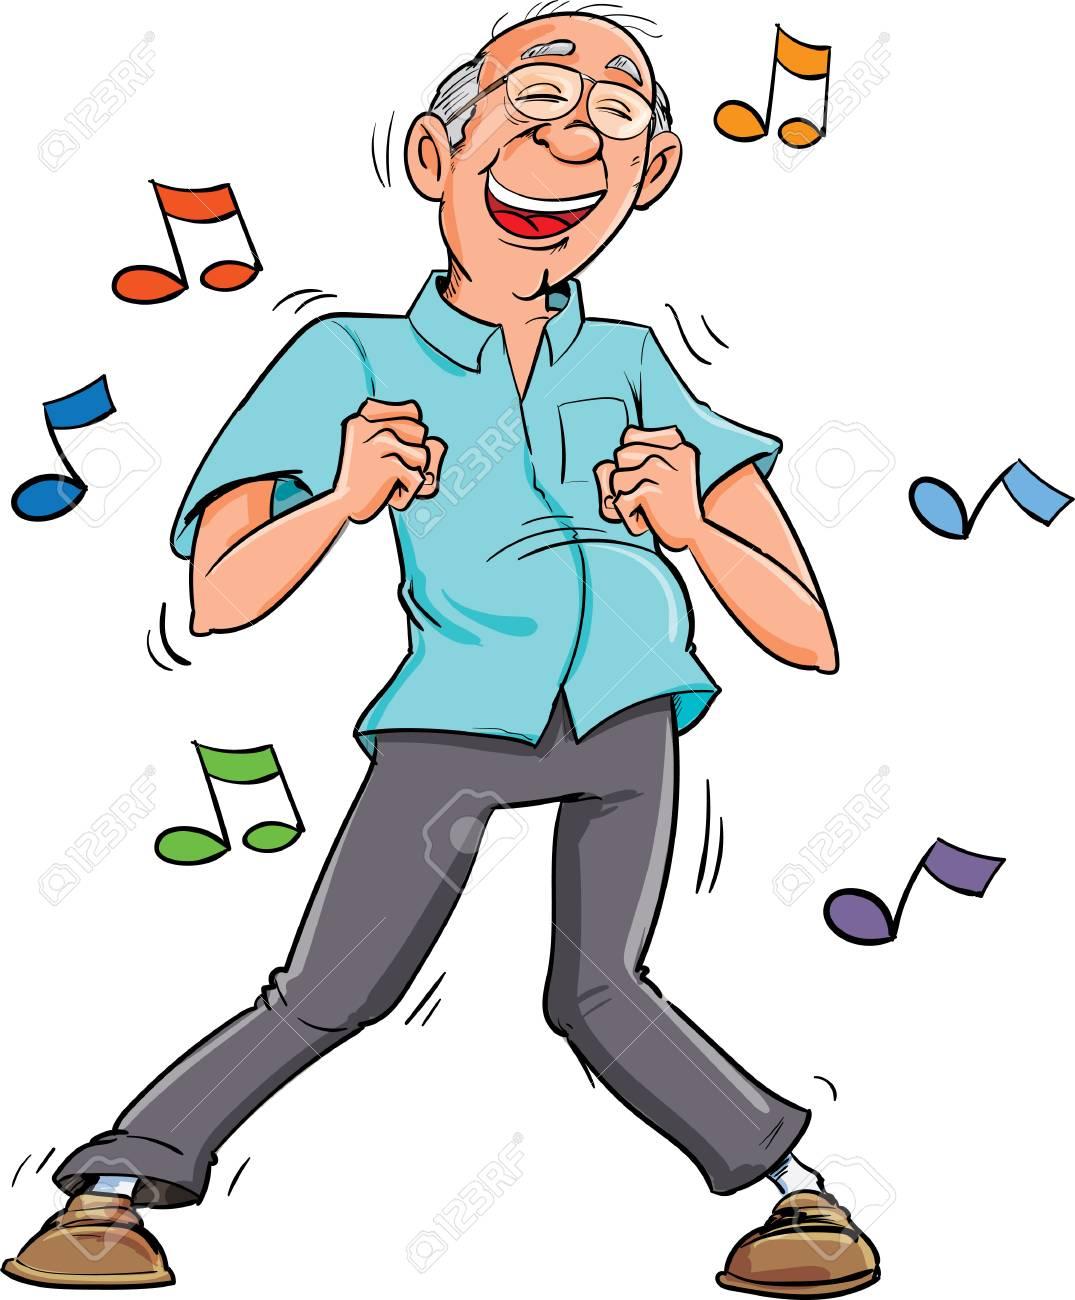 Cartoon old man dancing to music. His having fun.